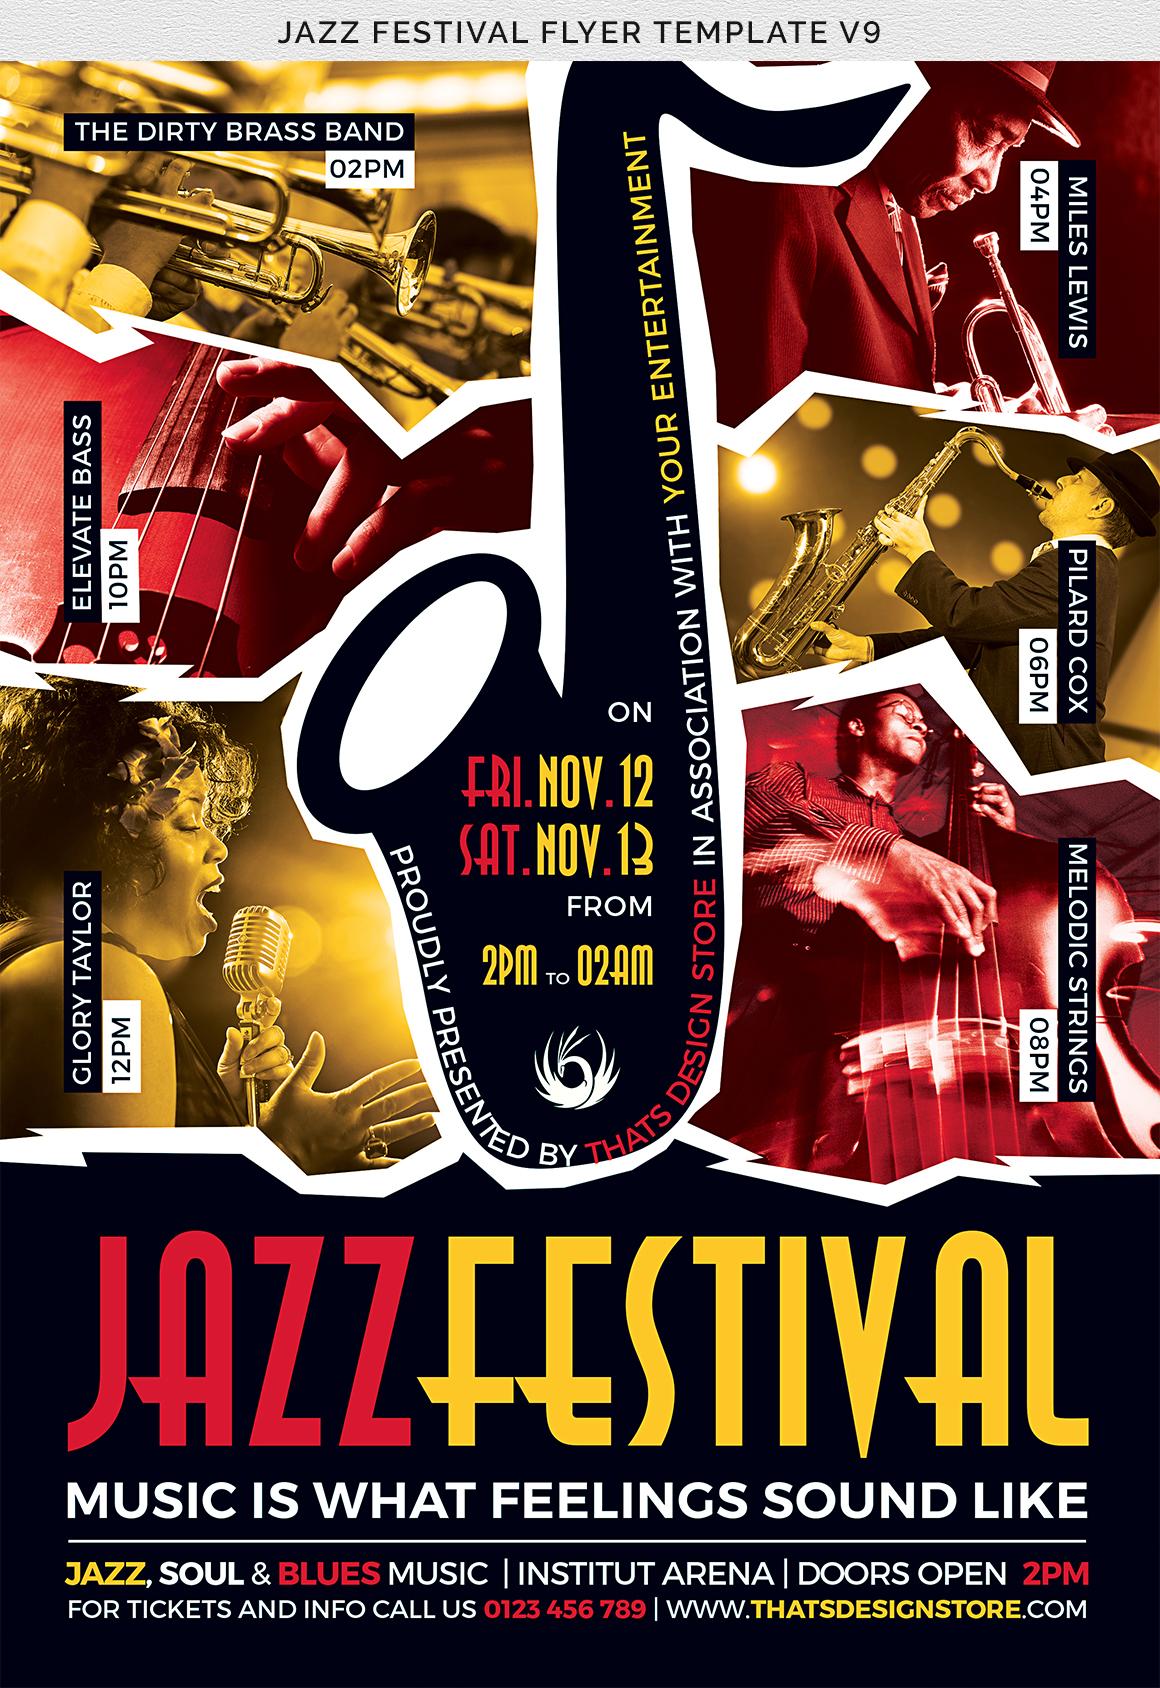 Jazz Festival Flyer Template V8 example image 7